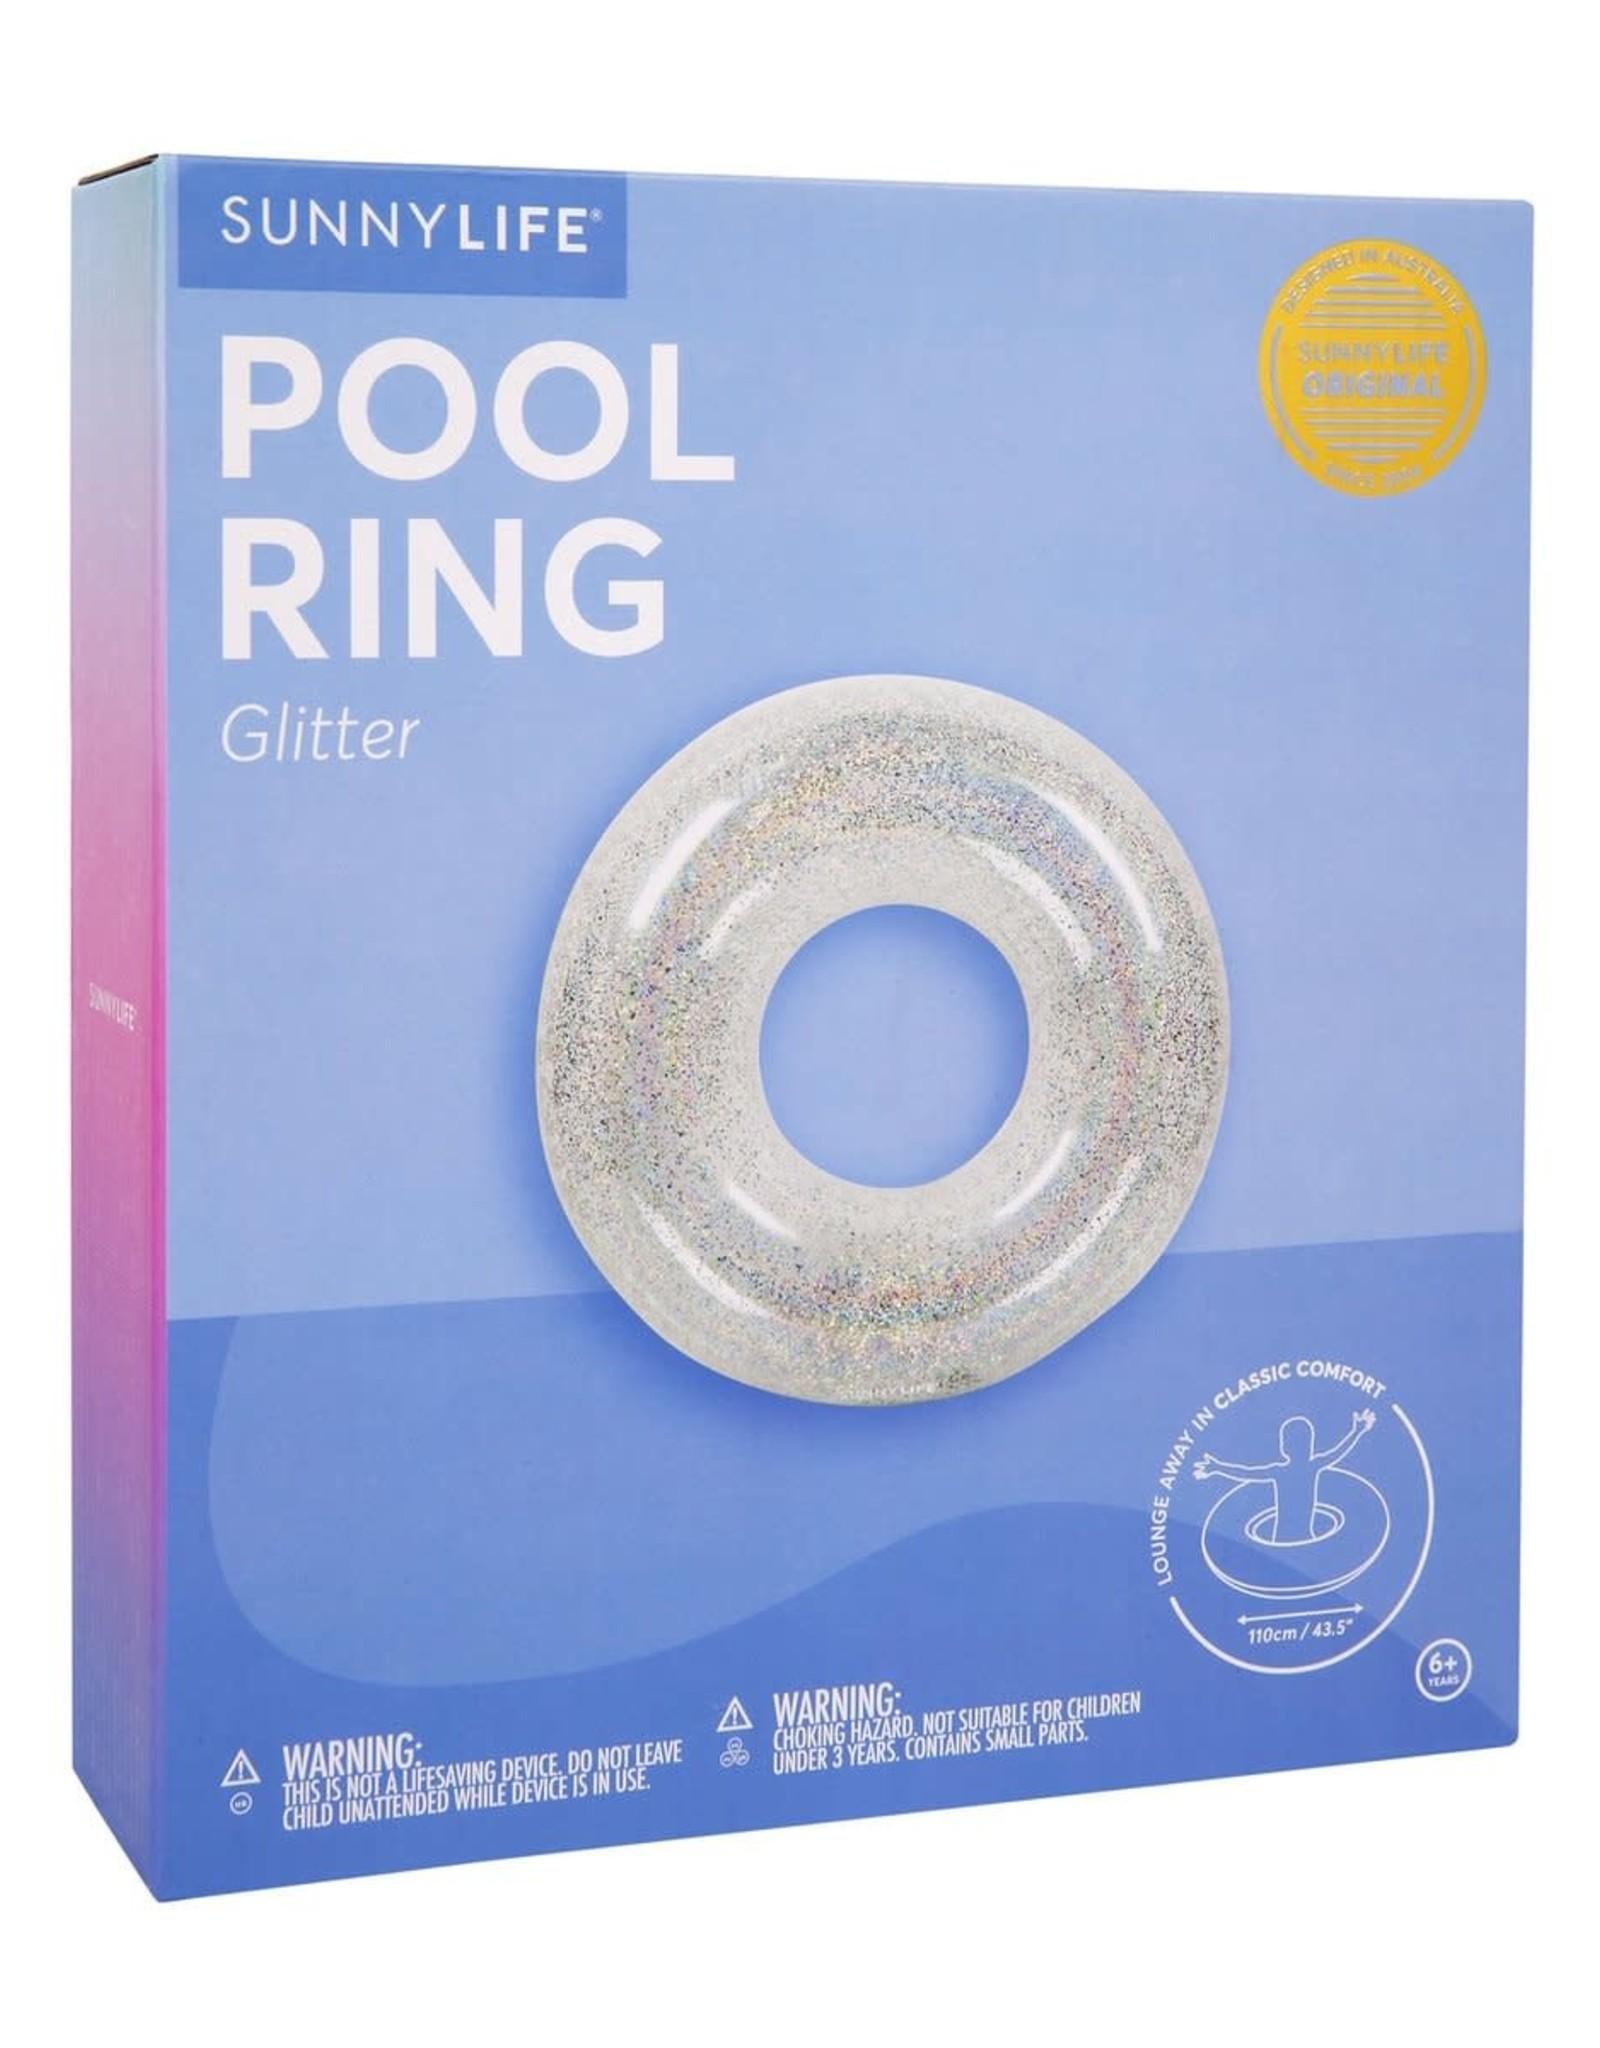 Sunnylife pool ring glitter